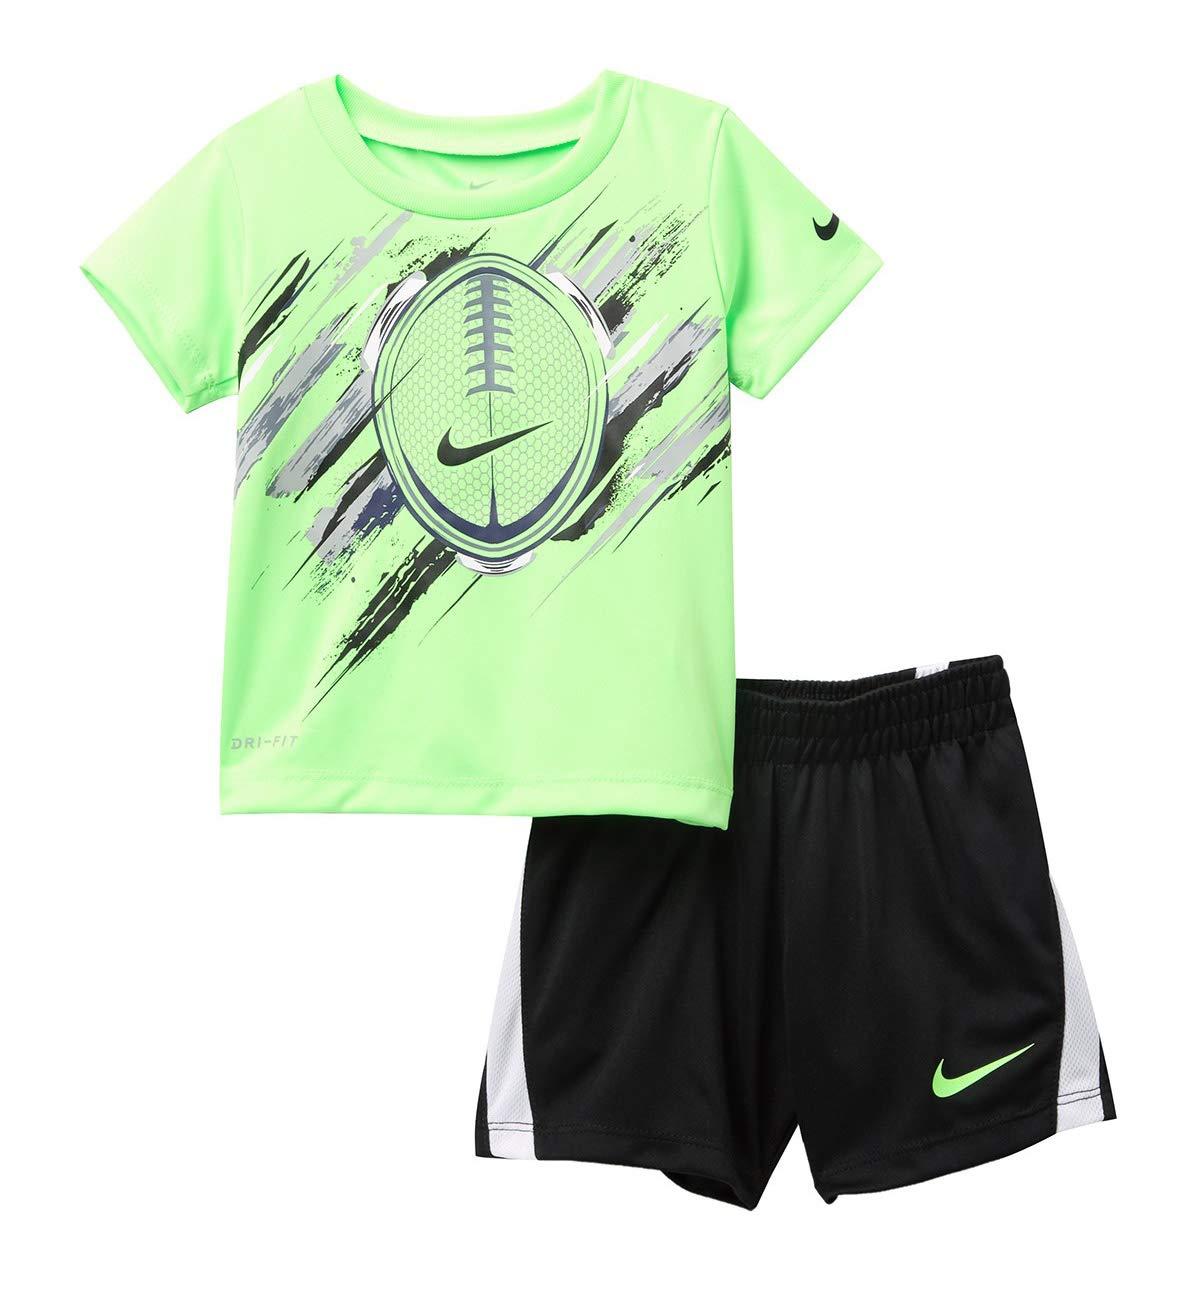 Nike Boy`s Dri-Fit T-Shirt & Shorts 2 Piece Set (Black(66E499-023)/Green, 12 Months)